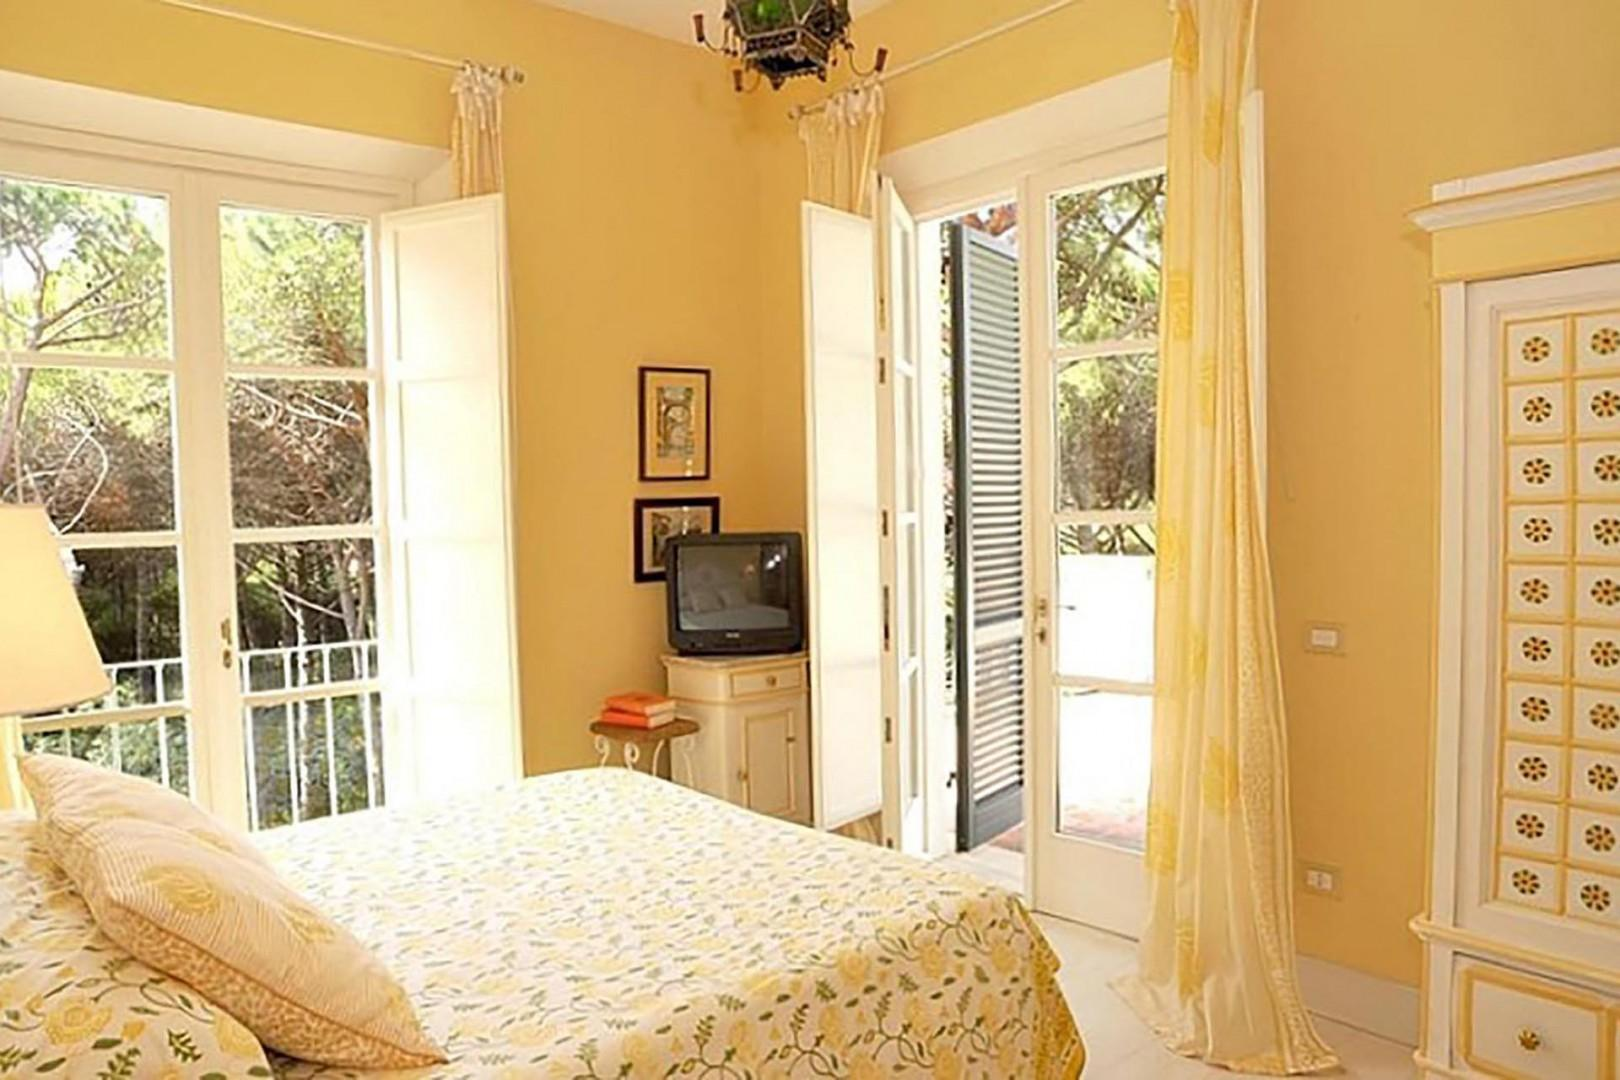 Bedroom 1 with en suite bathroom and balcony access.